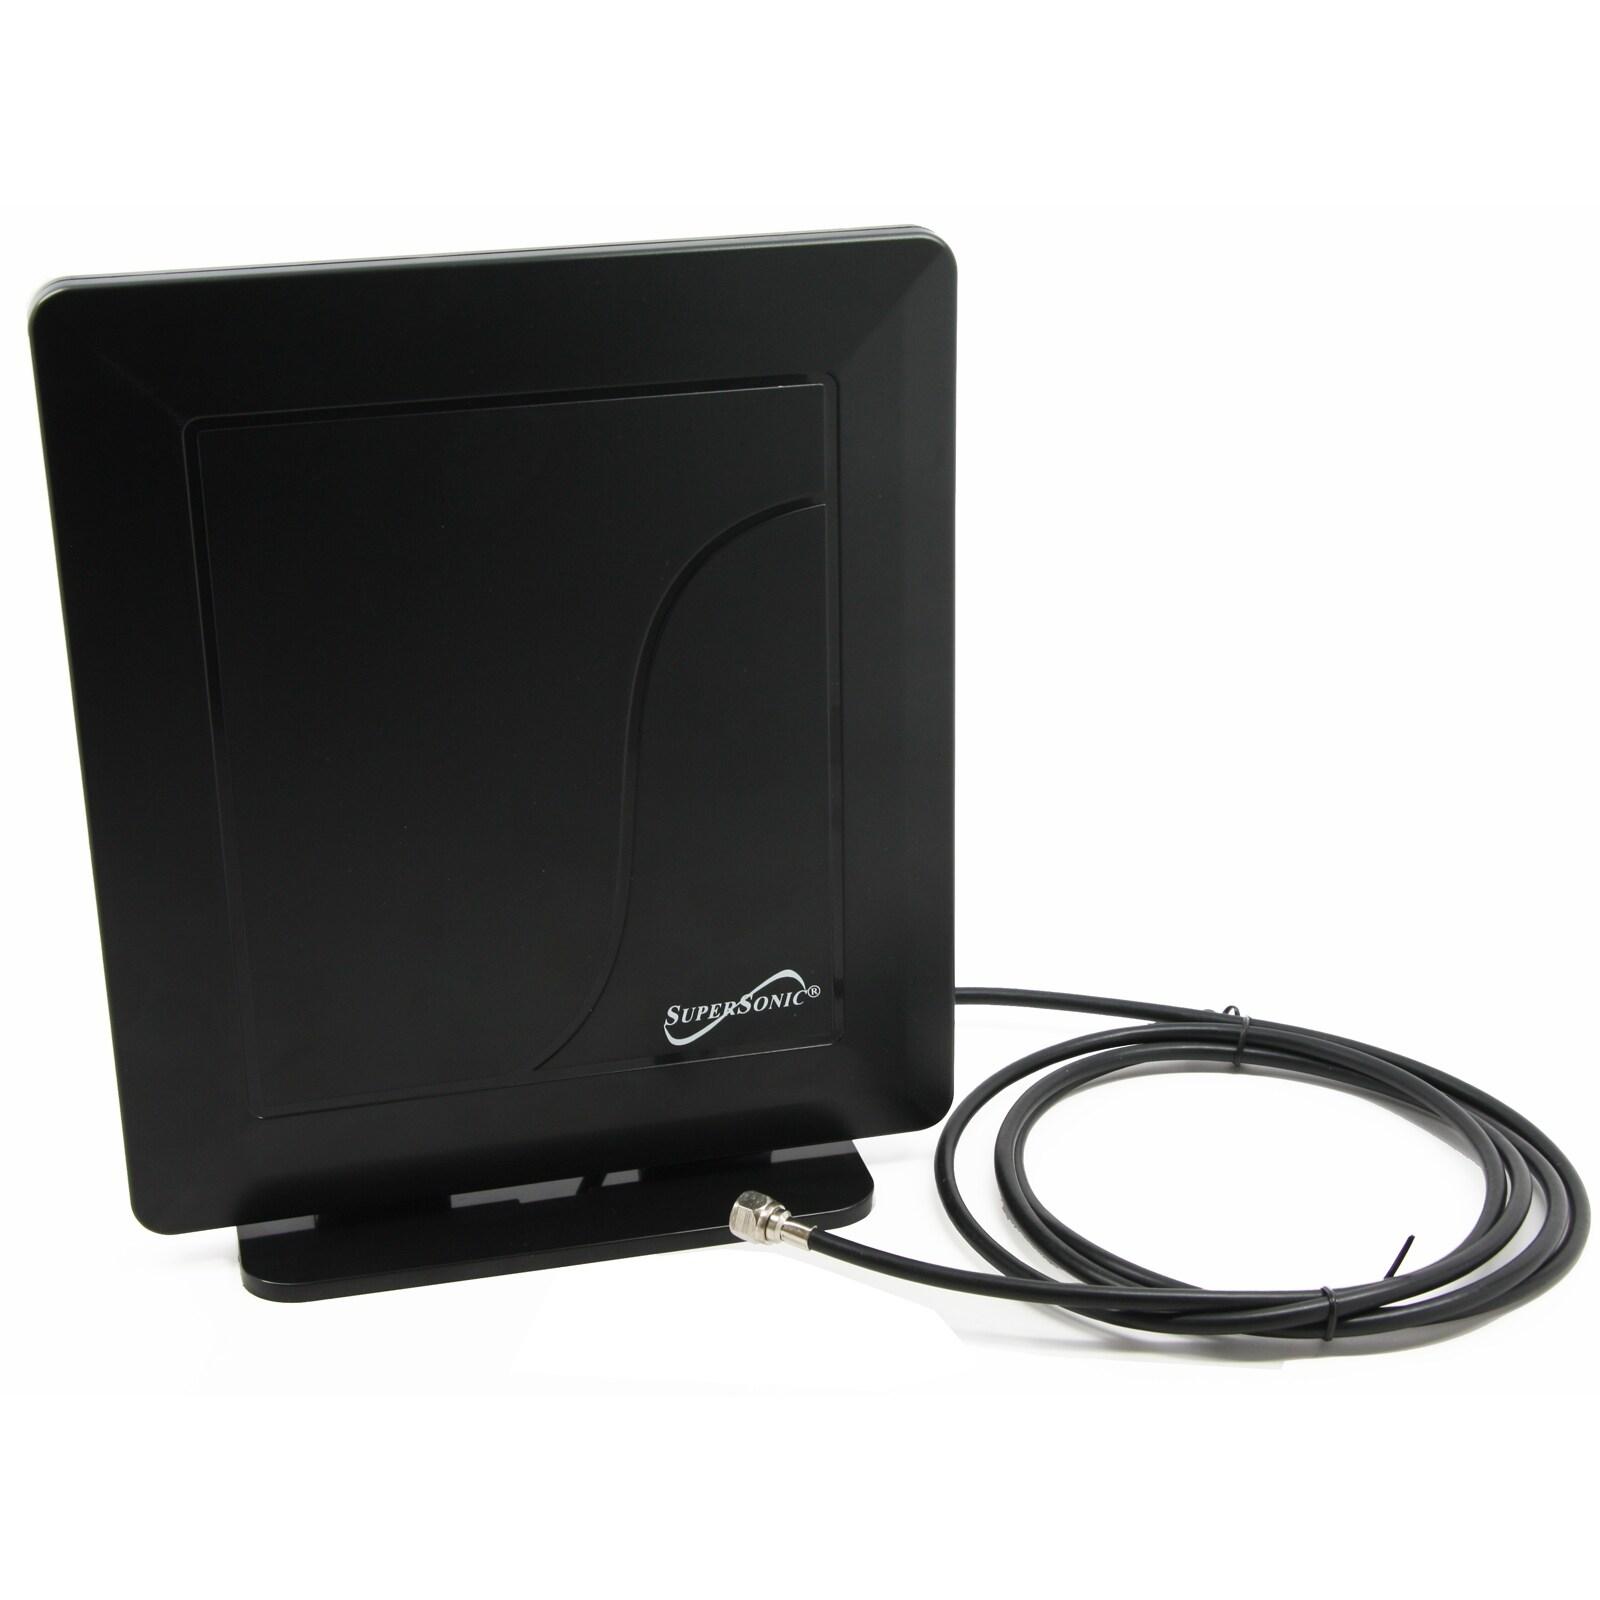 Supersonic HDTV Digital Indoor Antenna